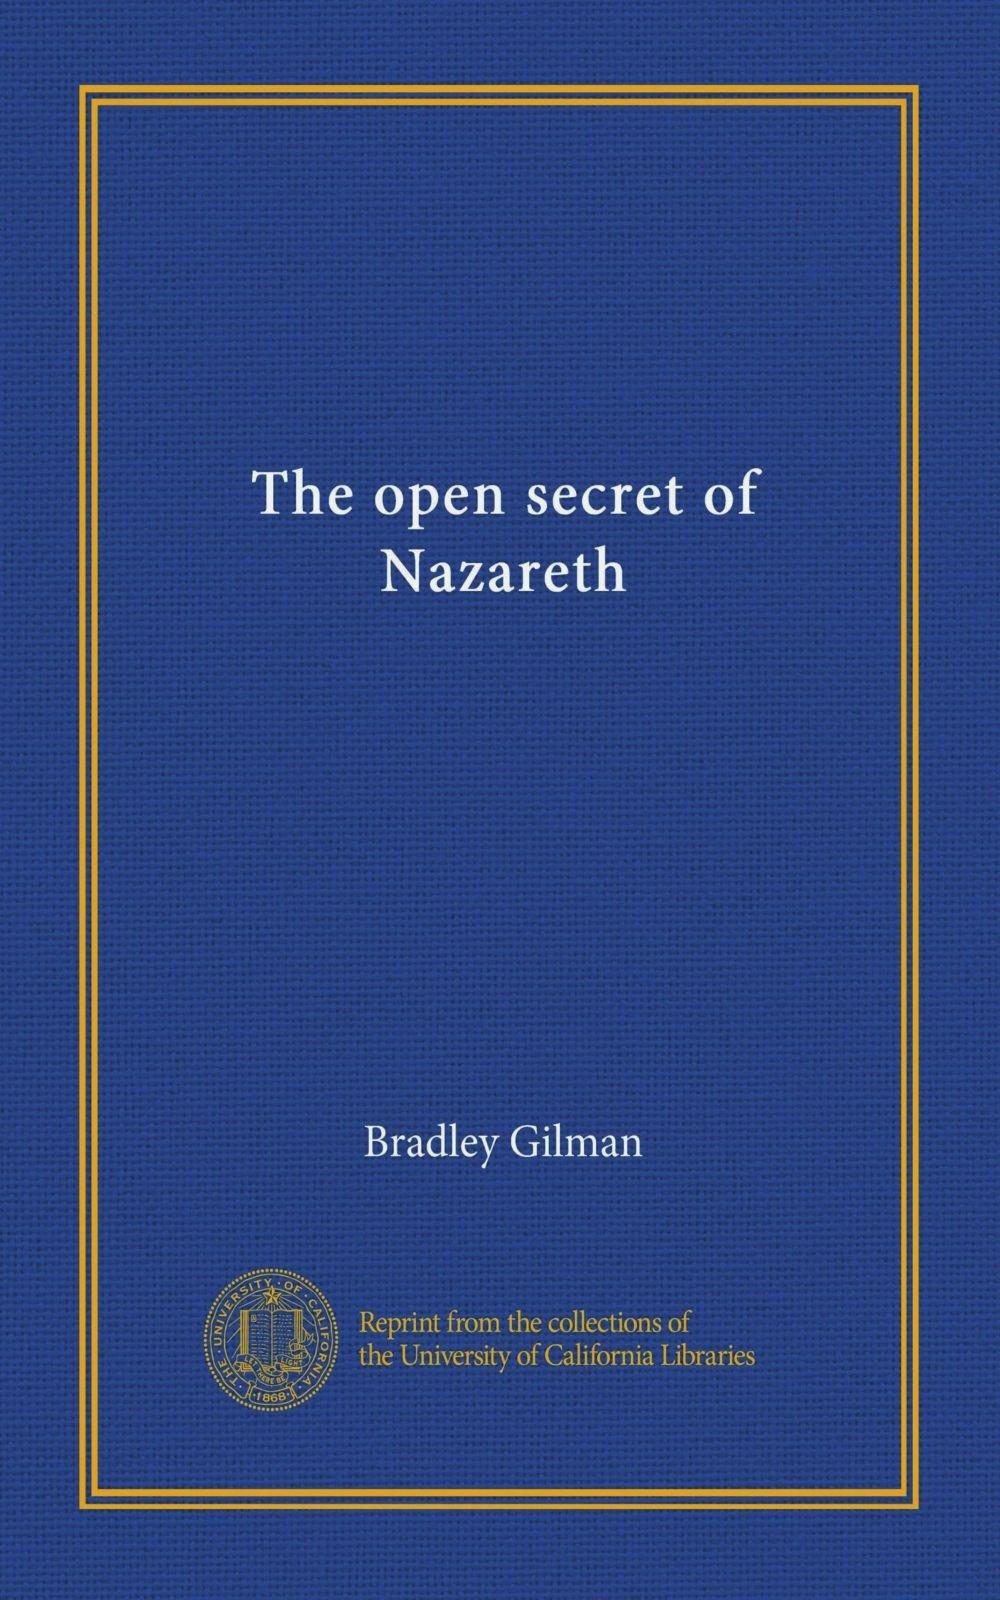 The open secret of Nazareth pdf